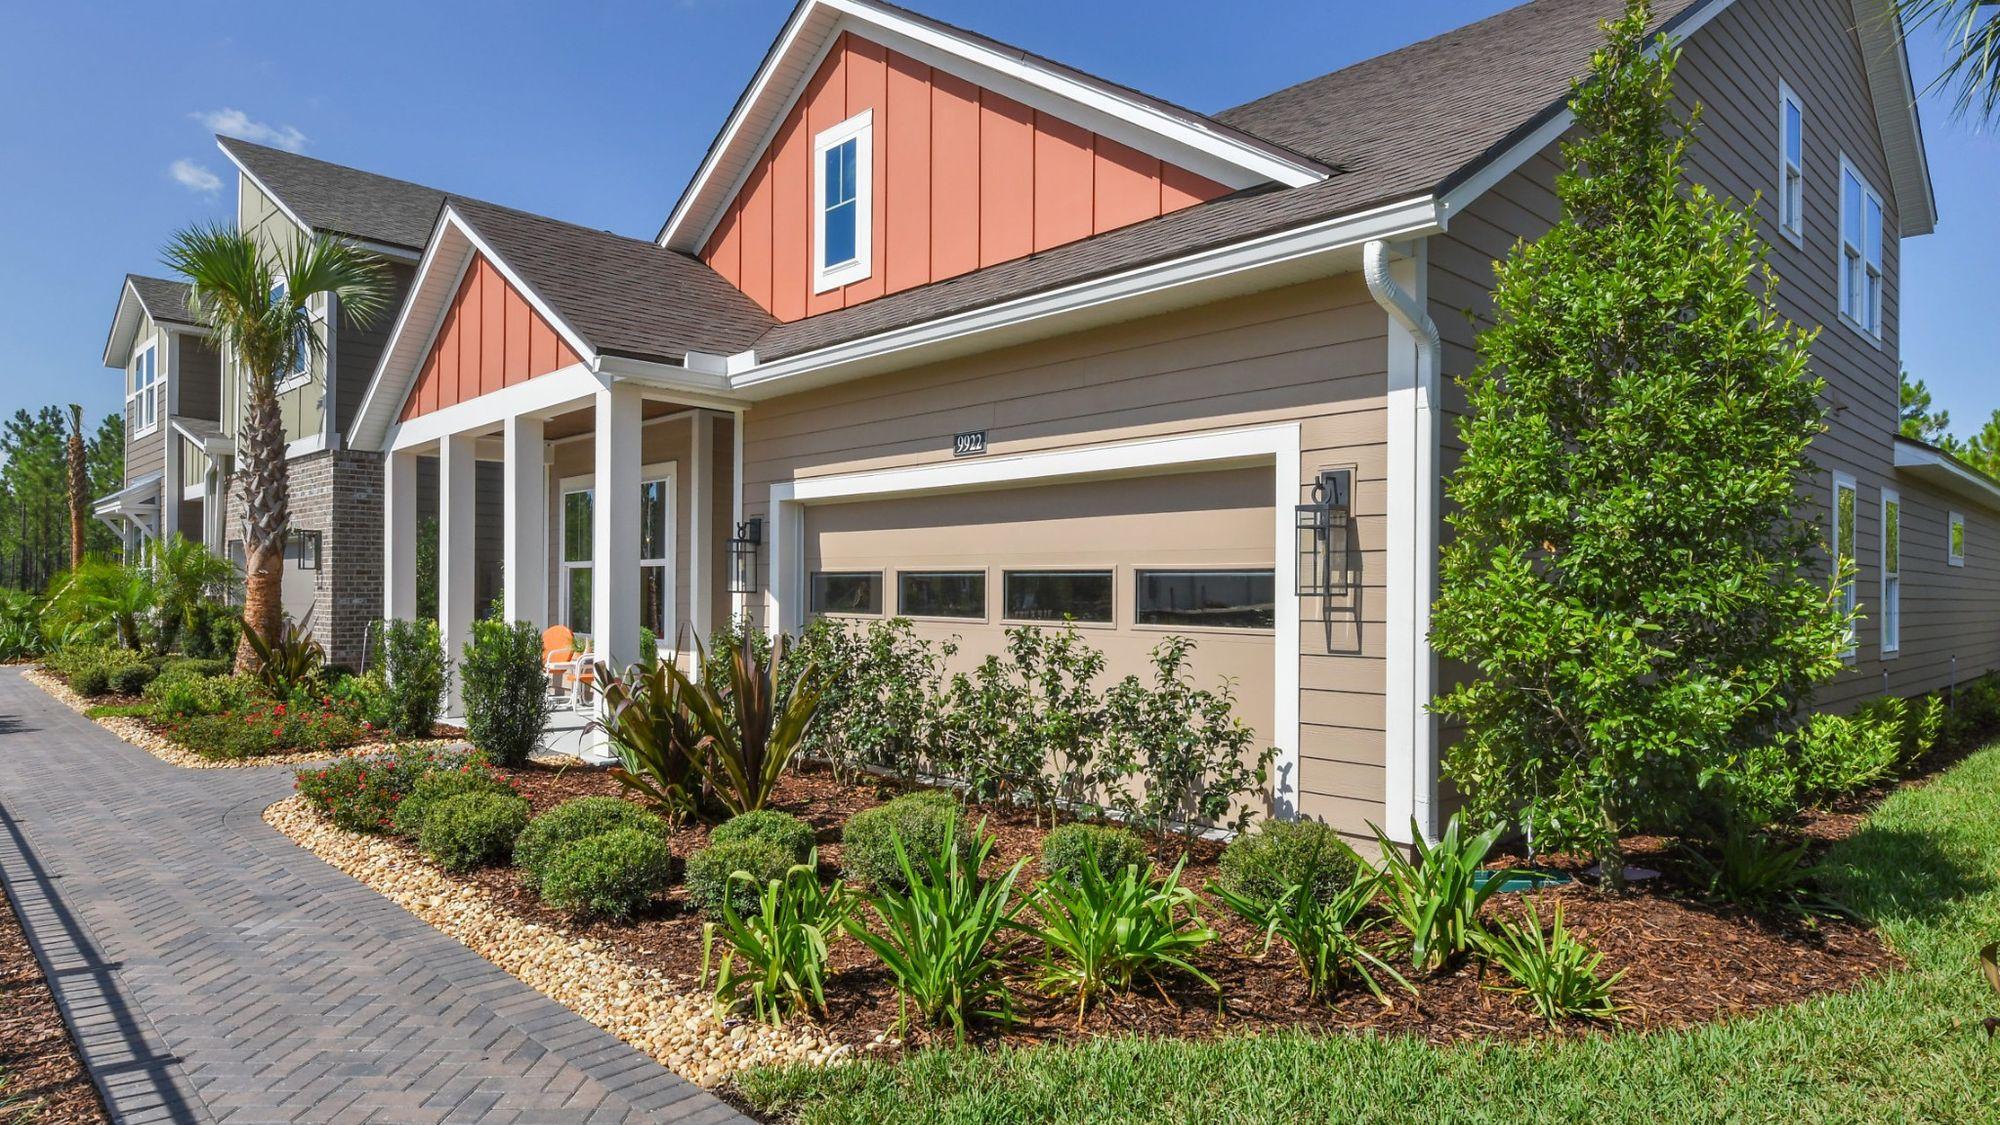 Royal Model - Modern Farmhouse Elevation - Garage View